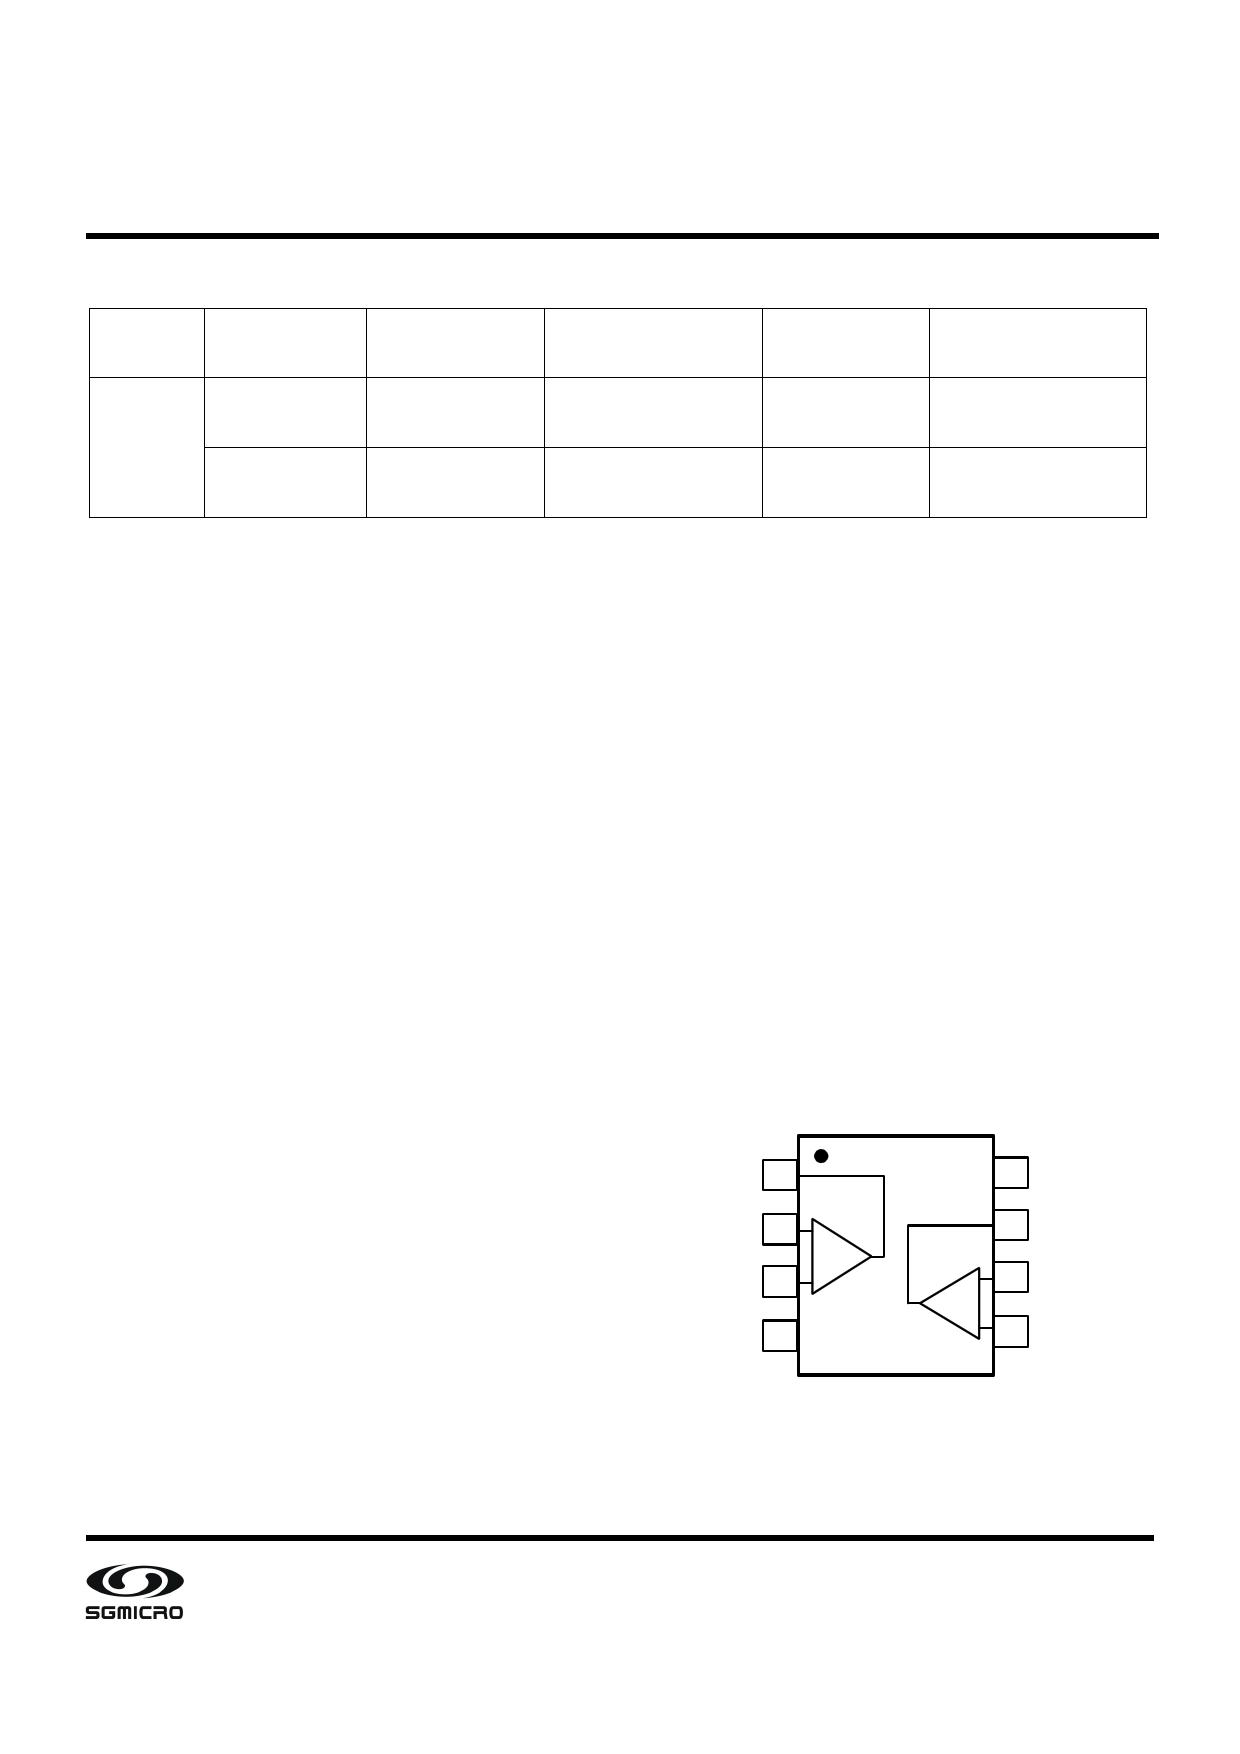 SGM8926 pdf, schematic